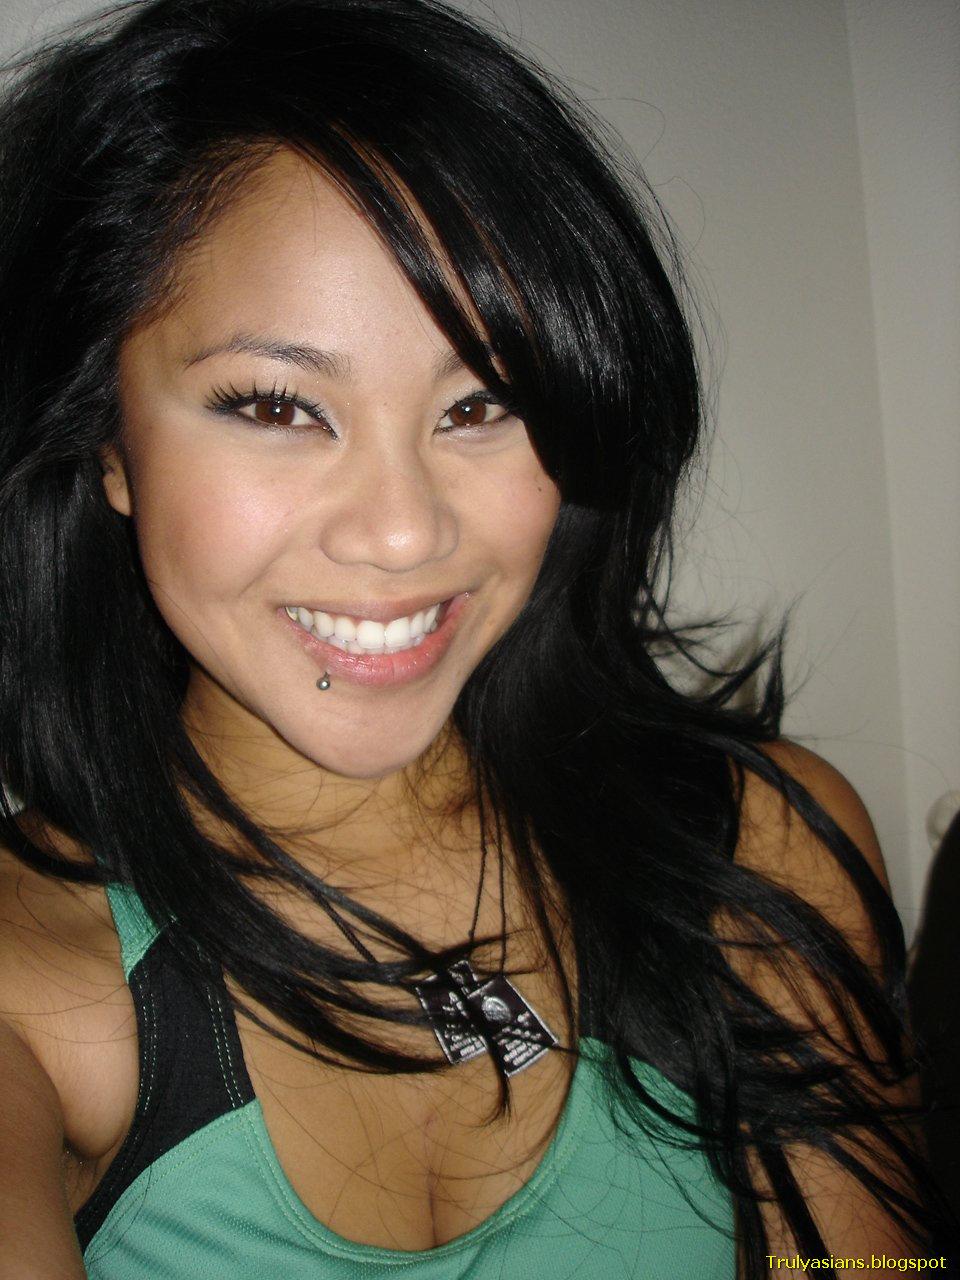 asian bj pussy - Hot asian girlfriend blowjob porn - Hot girl sex bf busty california asian  girl sex and